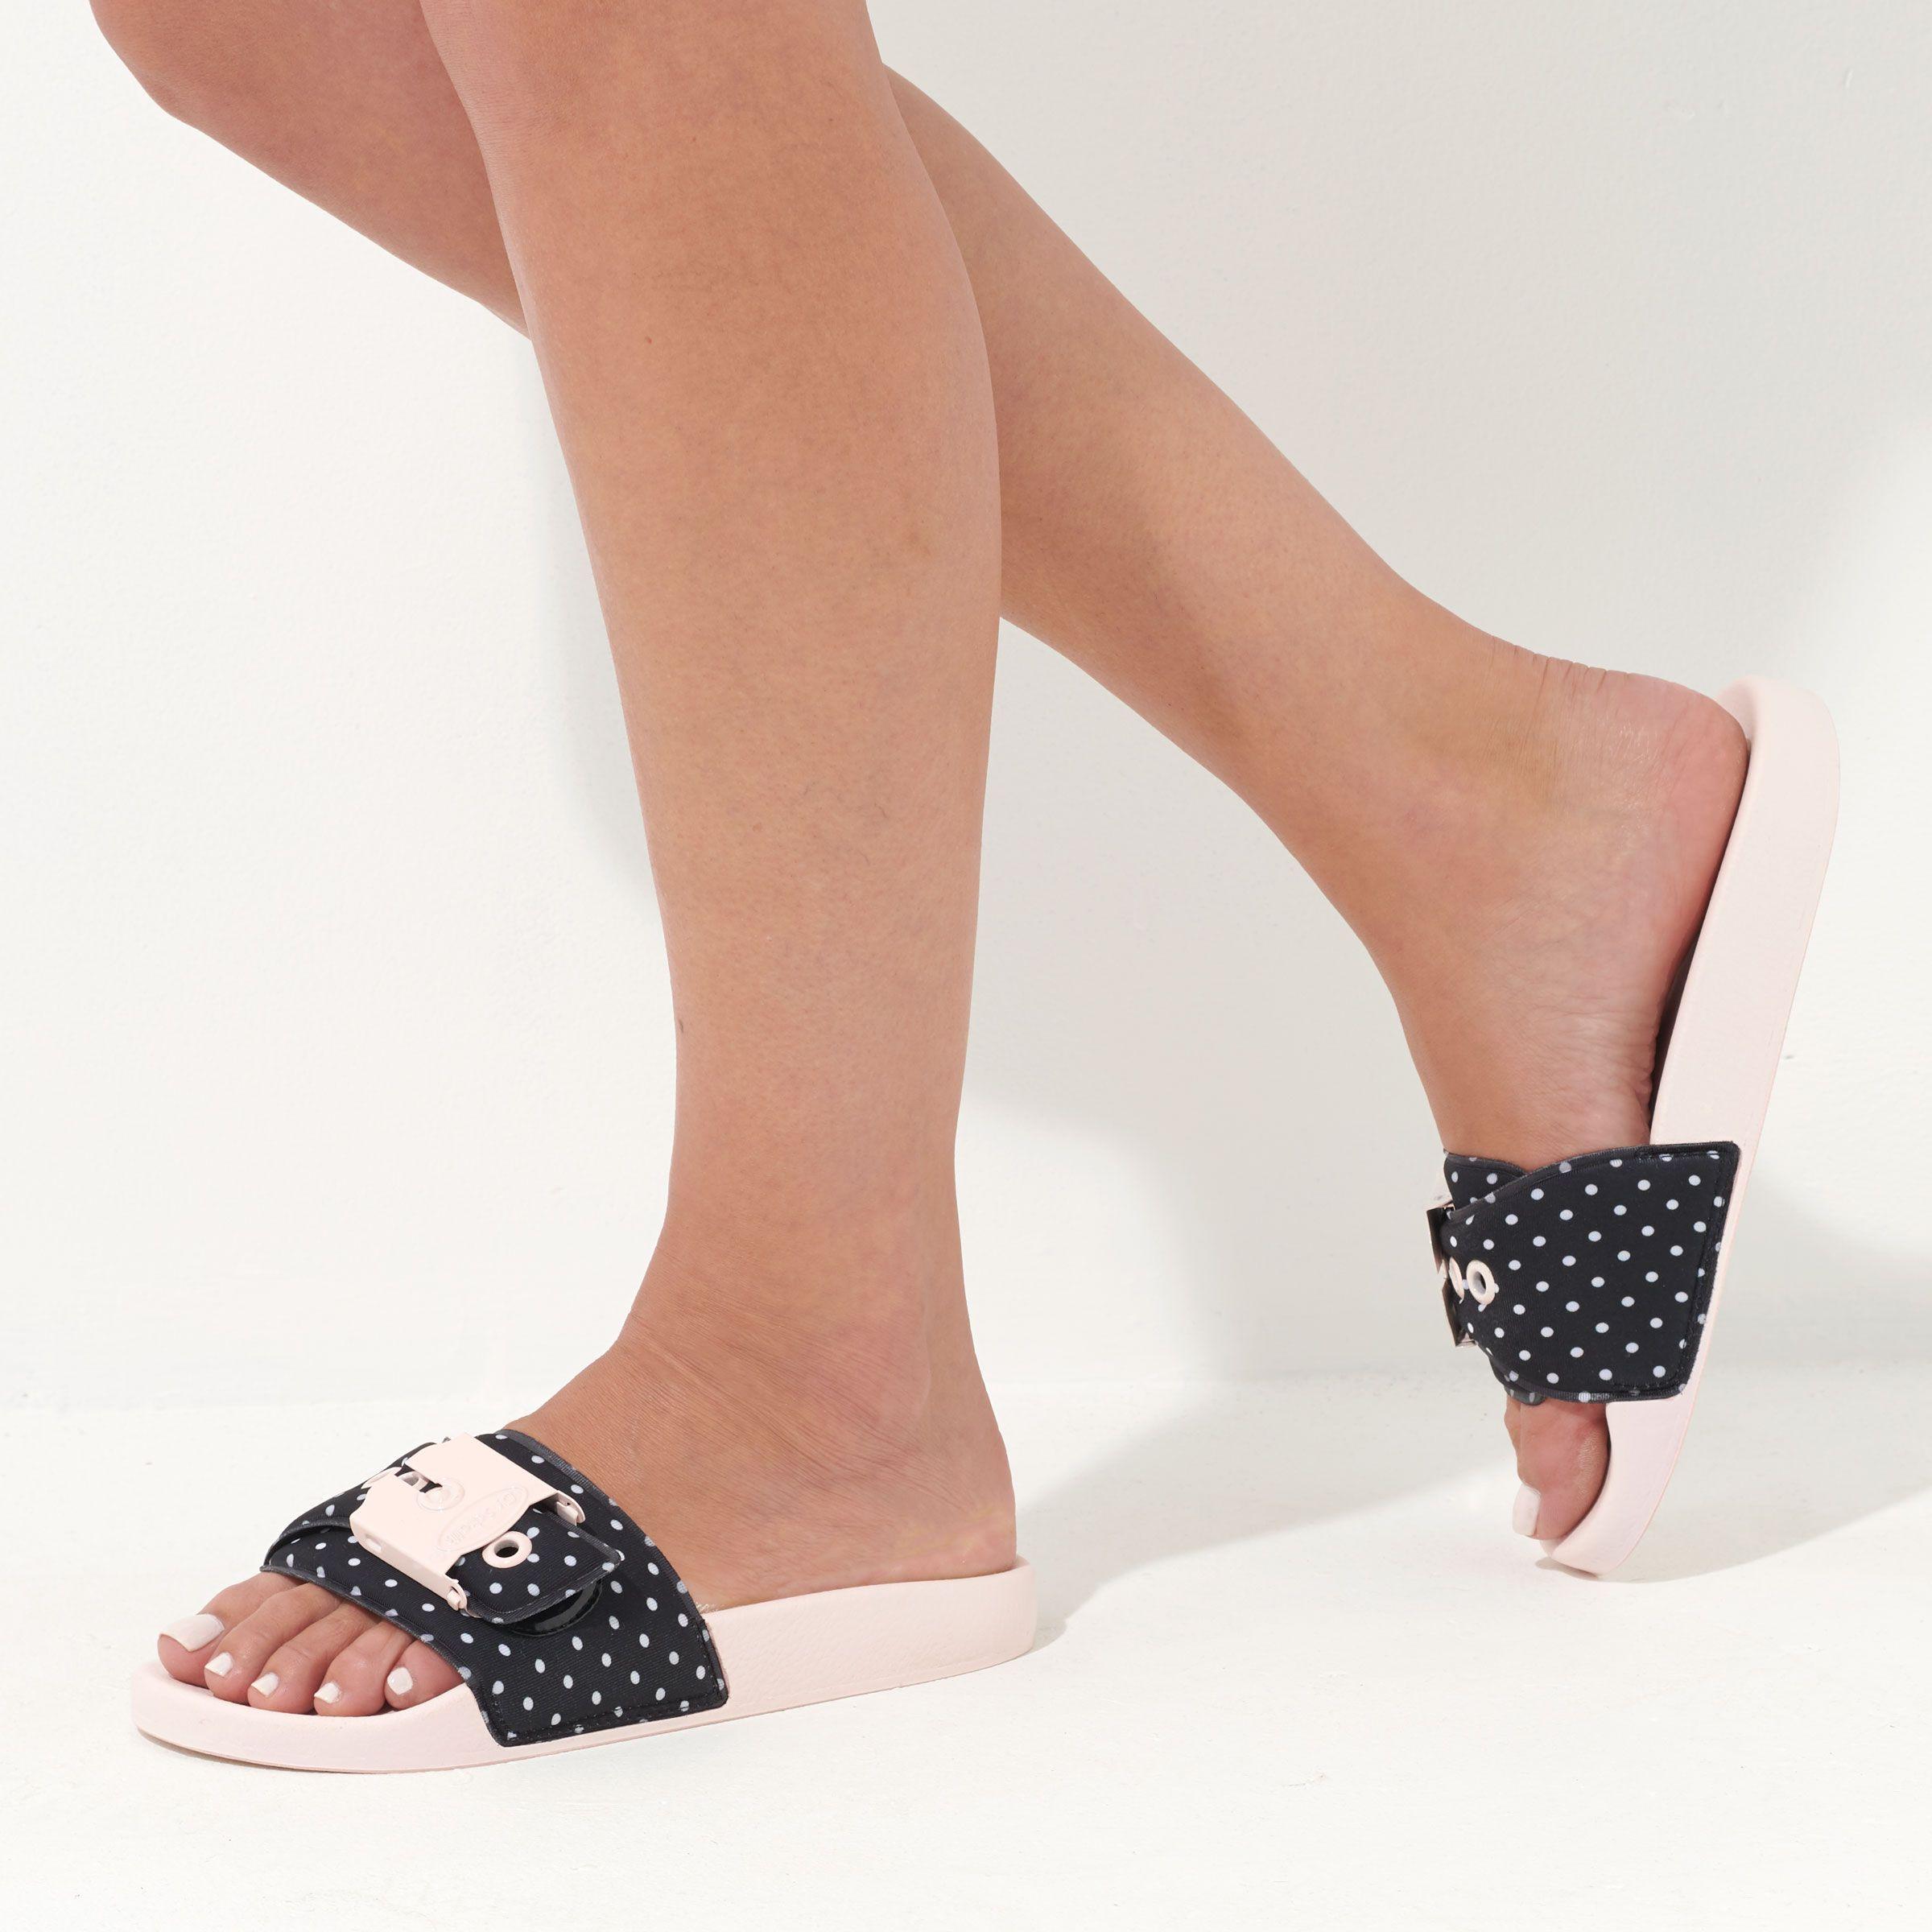 Dr Scholls Original Clog in 2020 | Dr scholls sandals